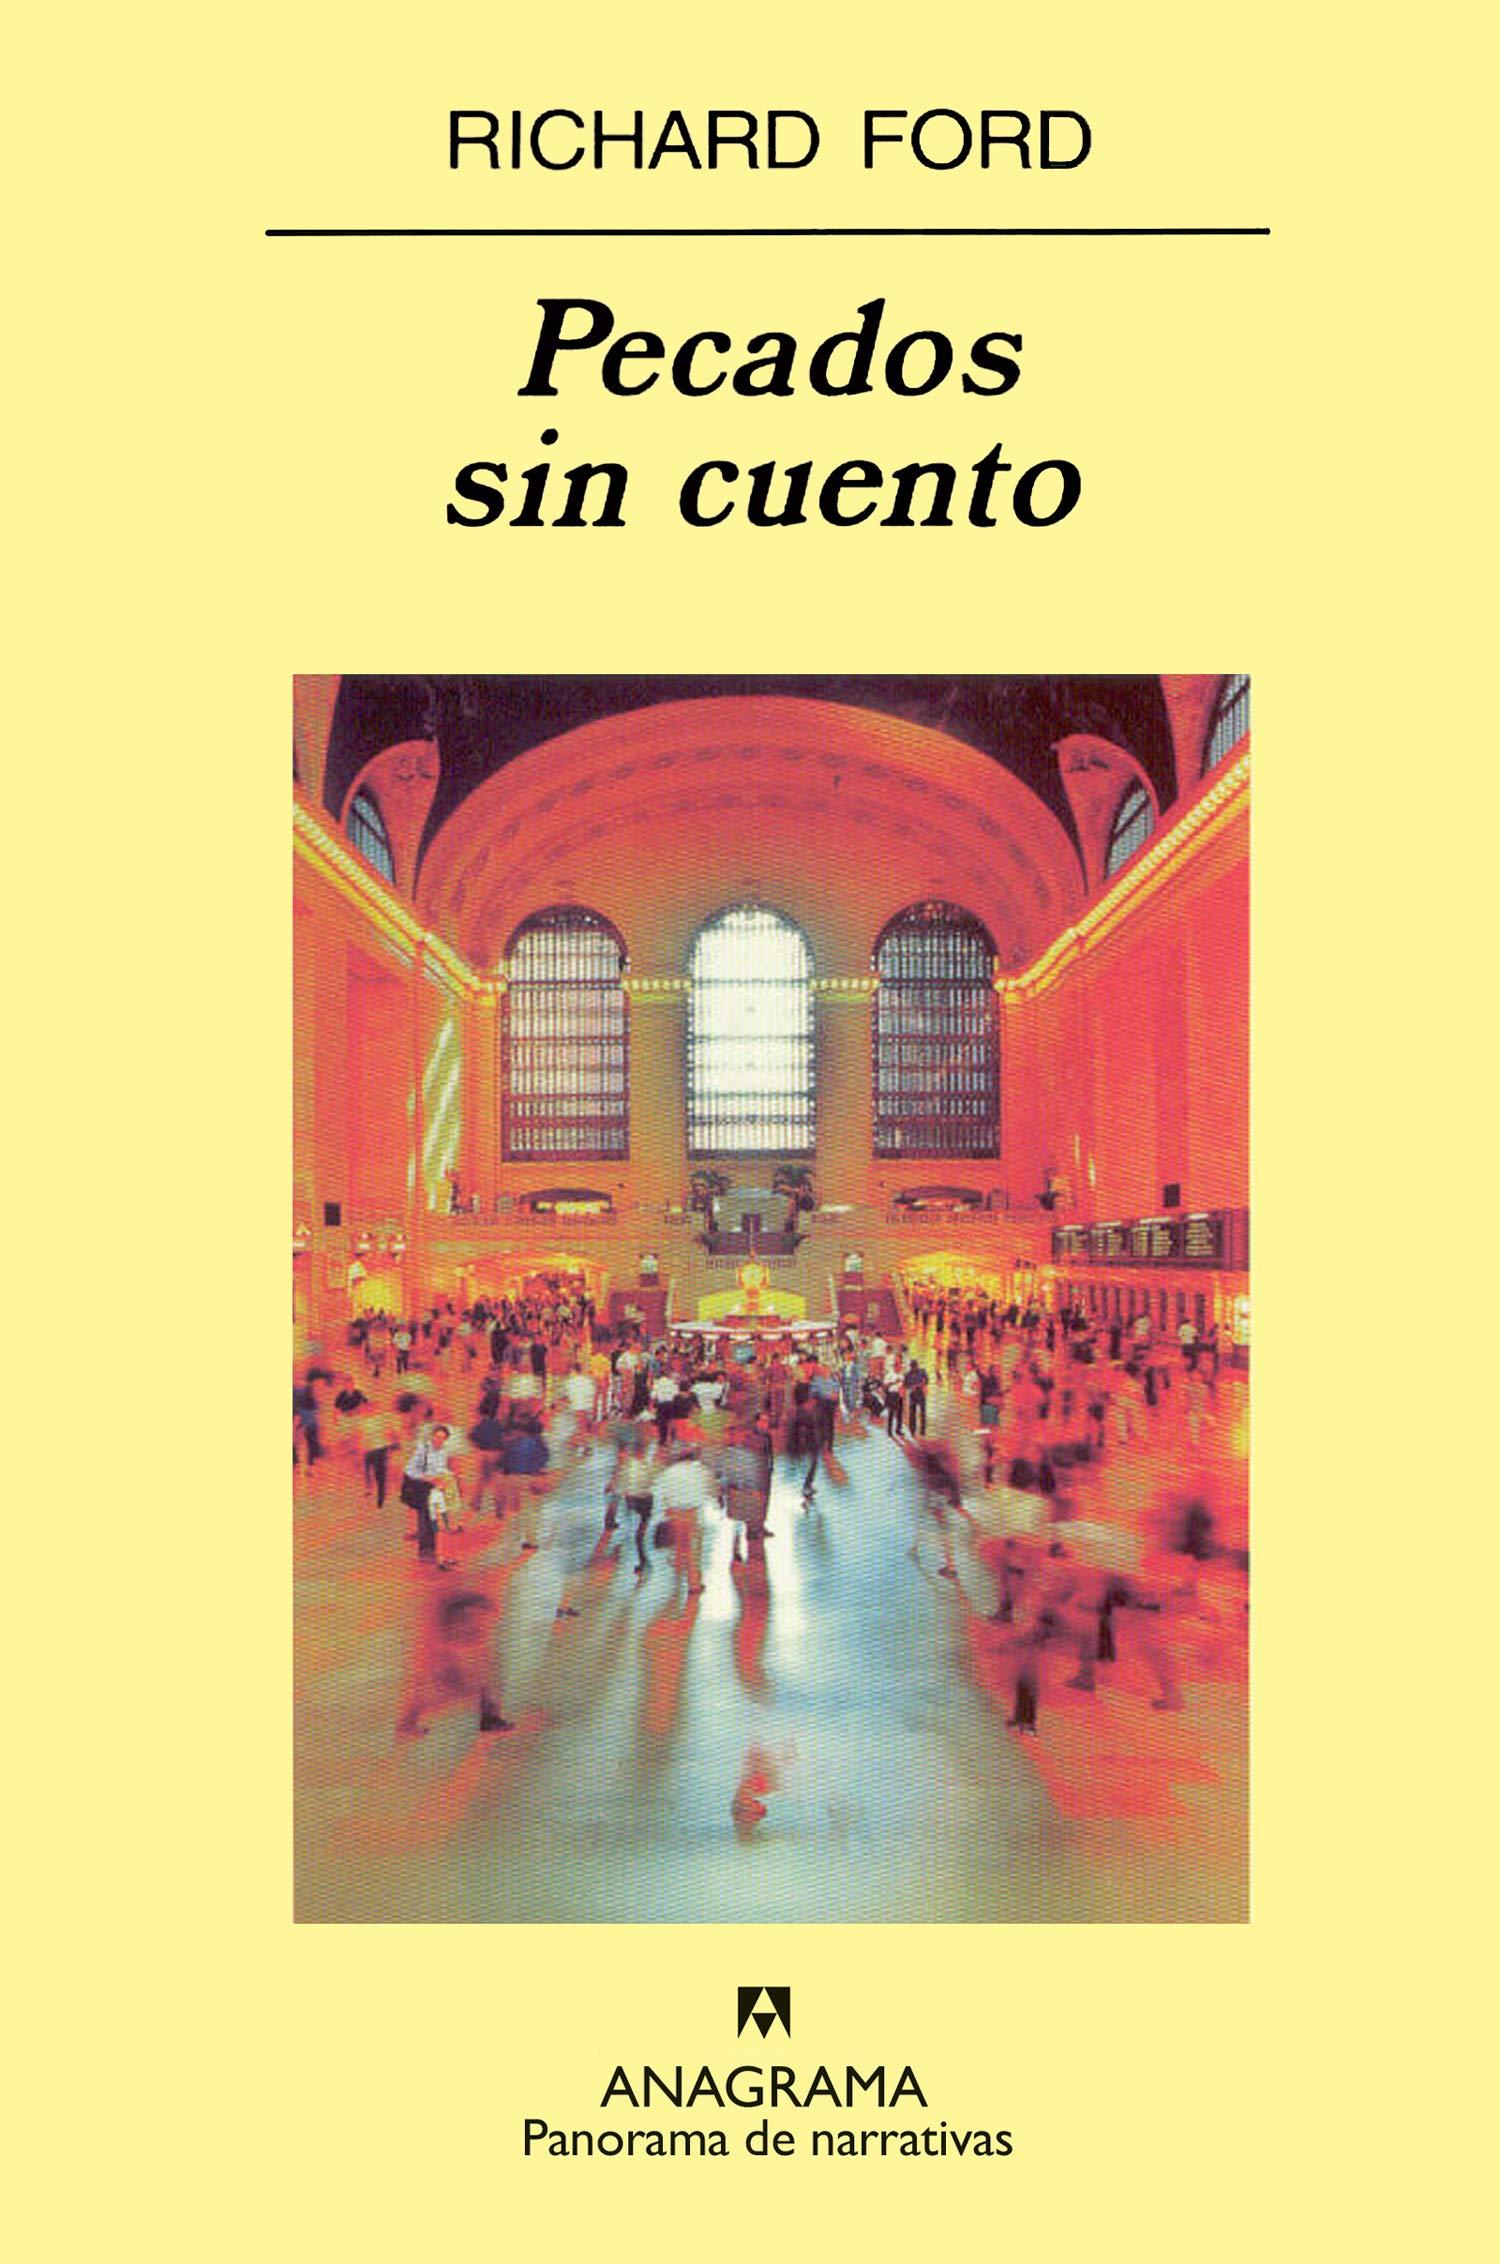 Pecados sin cuento (Panorama de narrativas): Amazon.es: Ford, Richard, Damián Alou: Libros